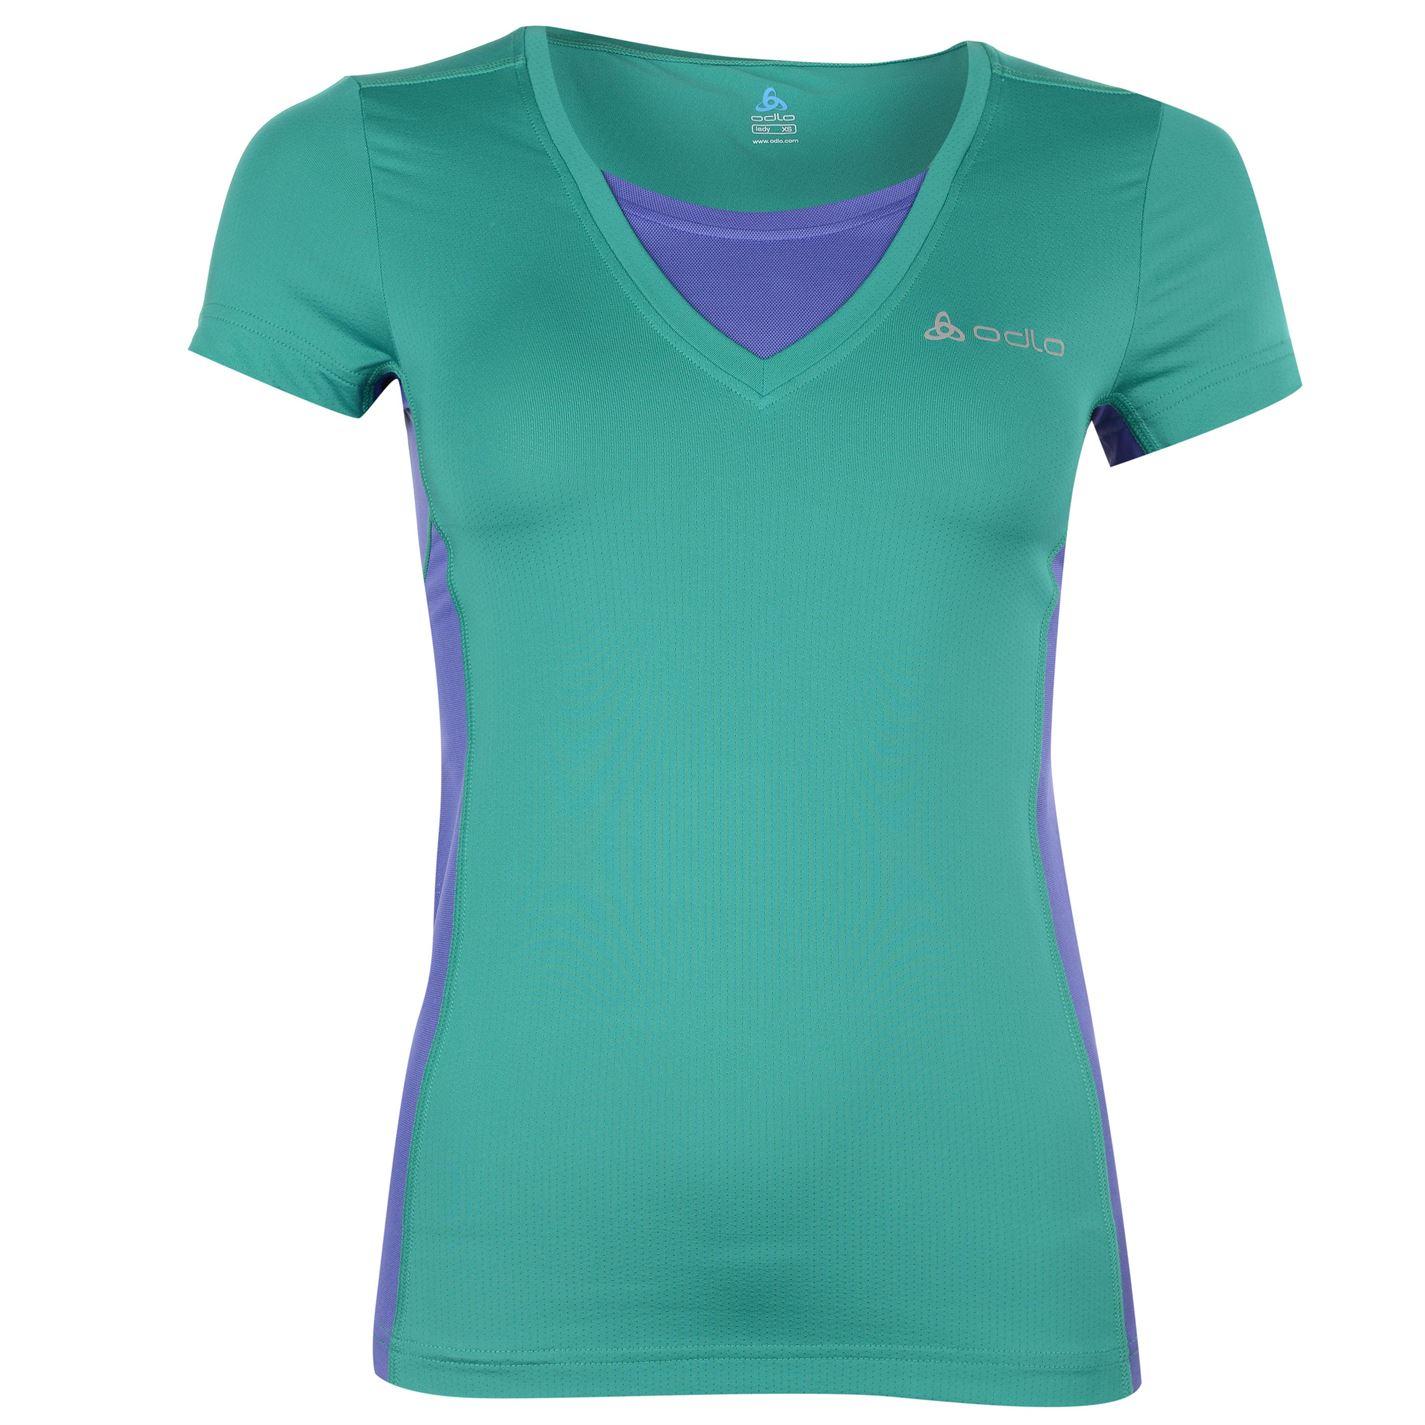 Odlo Kimber Ladies Short Sleeved Ladies T Shirt